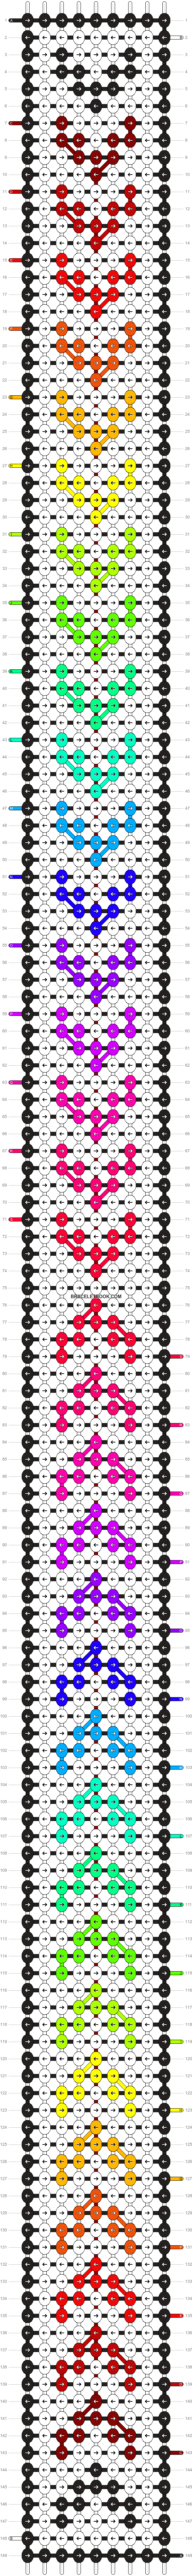 Alpha pattern #20815 pattern